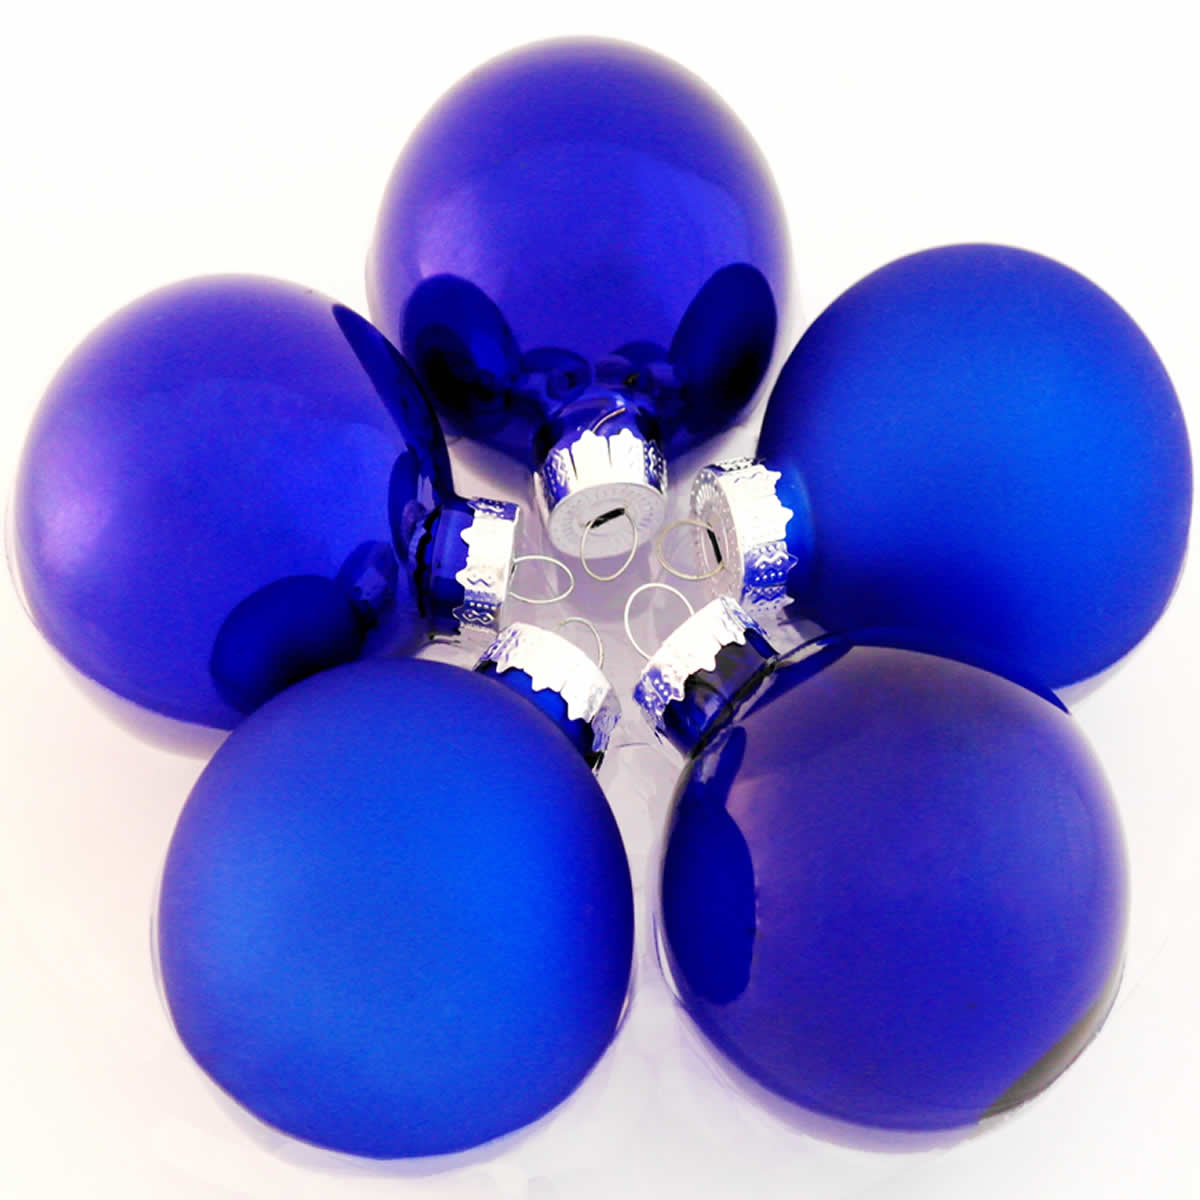 20 design weihnachtskugeln christbaumkugeln kugel glas for Christbaumkugeln blau